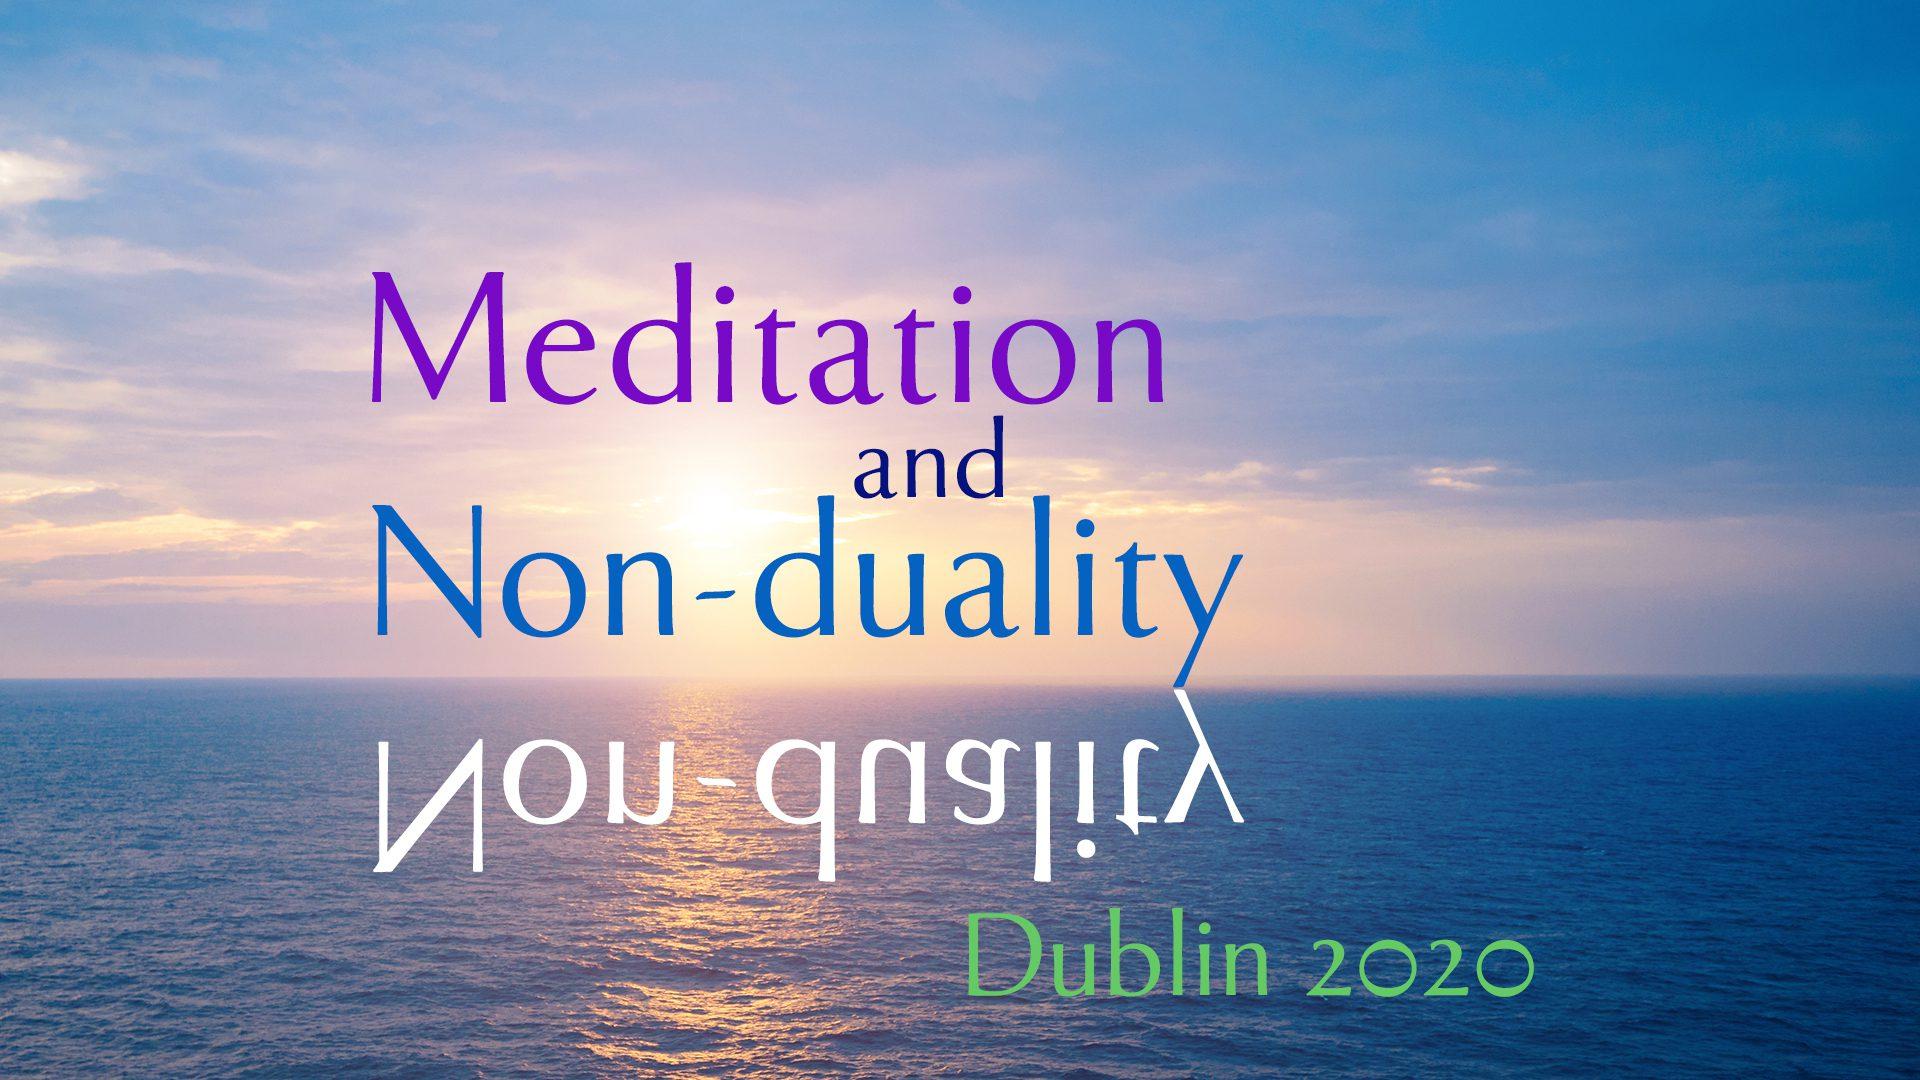 meditation non duality